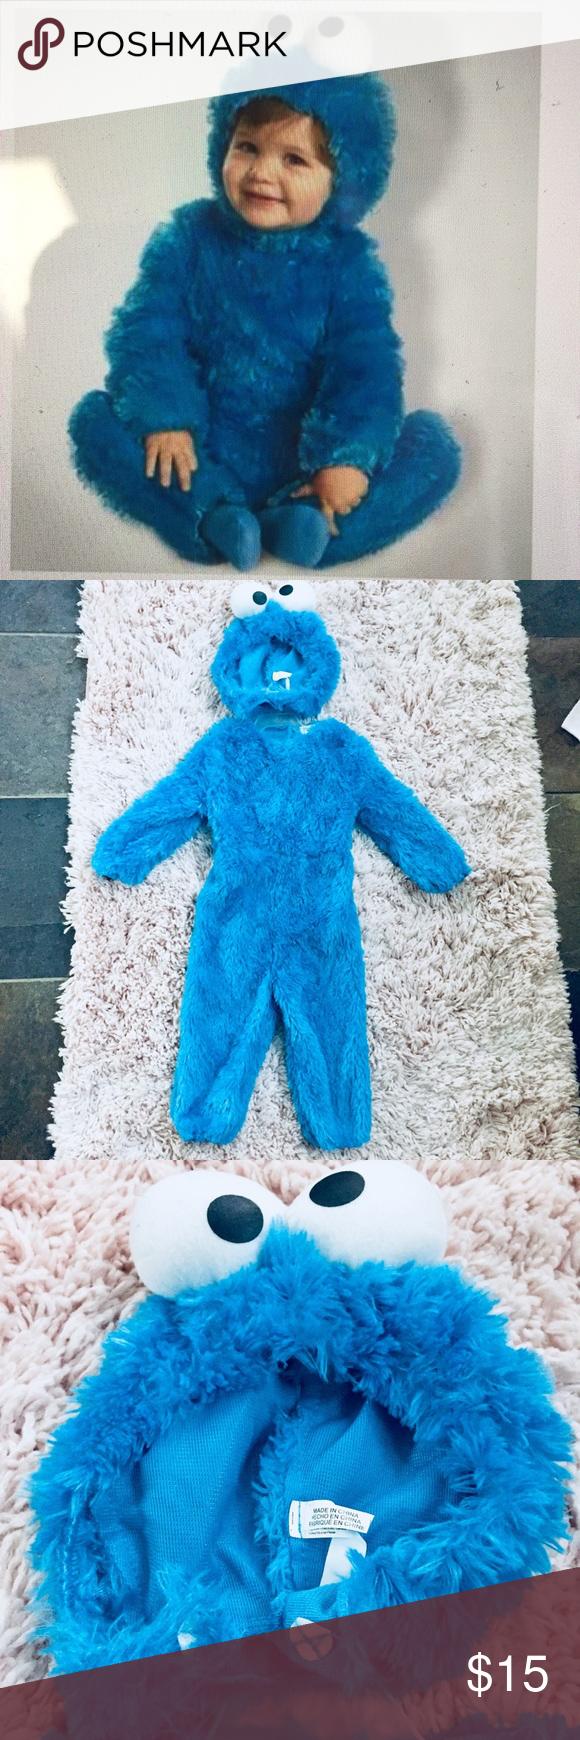 Baby Cookie Monster Halloween Costume 6 9 Months Cookie Monster Halloween Costume Baby Cookie Monster Monster Cookies Halloween